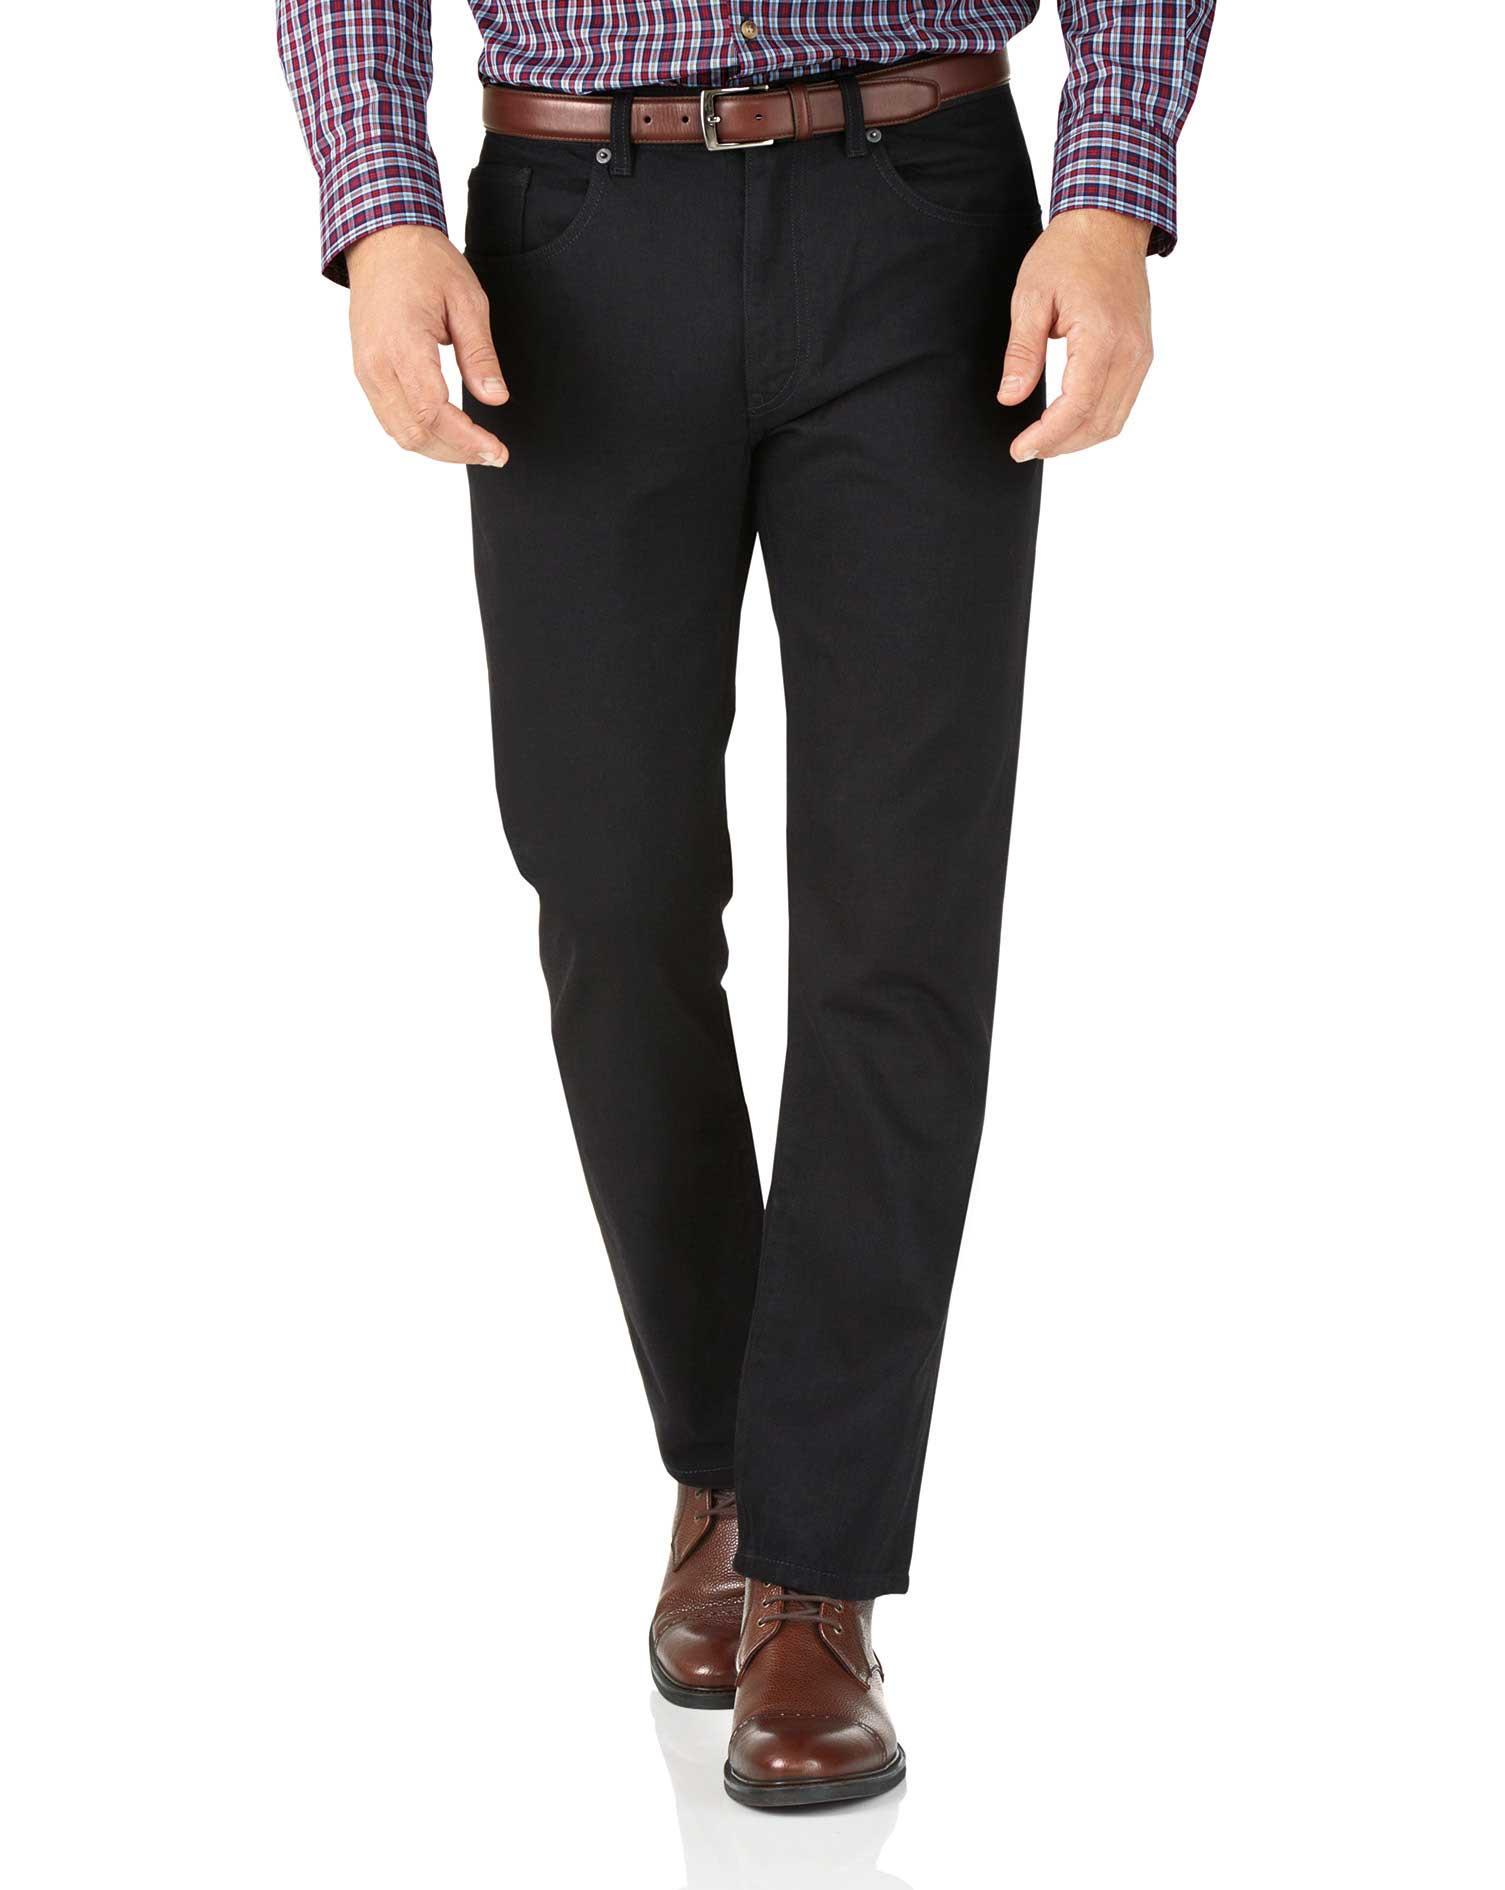 Black Slim Fit 5 Pocket Jeans Size W38 L34 by Charles Tyrwhitt